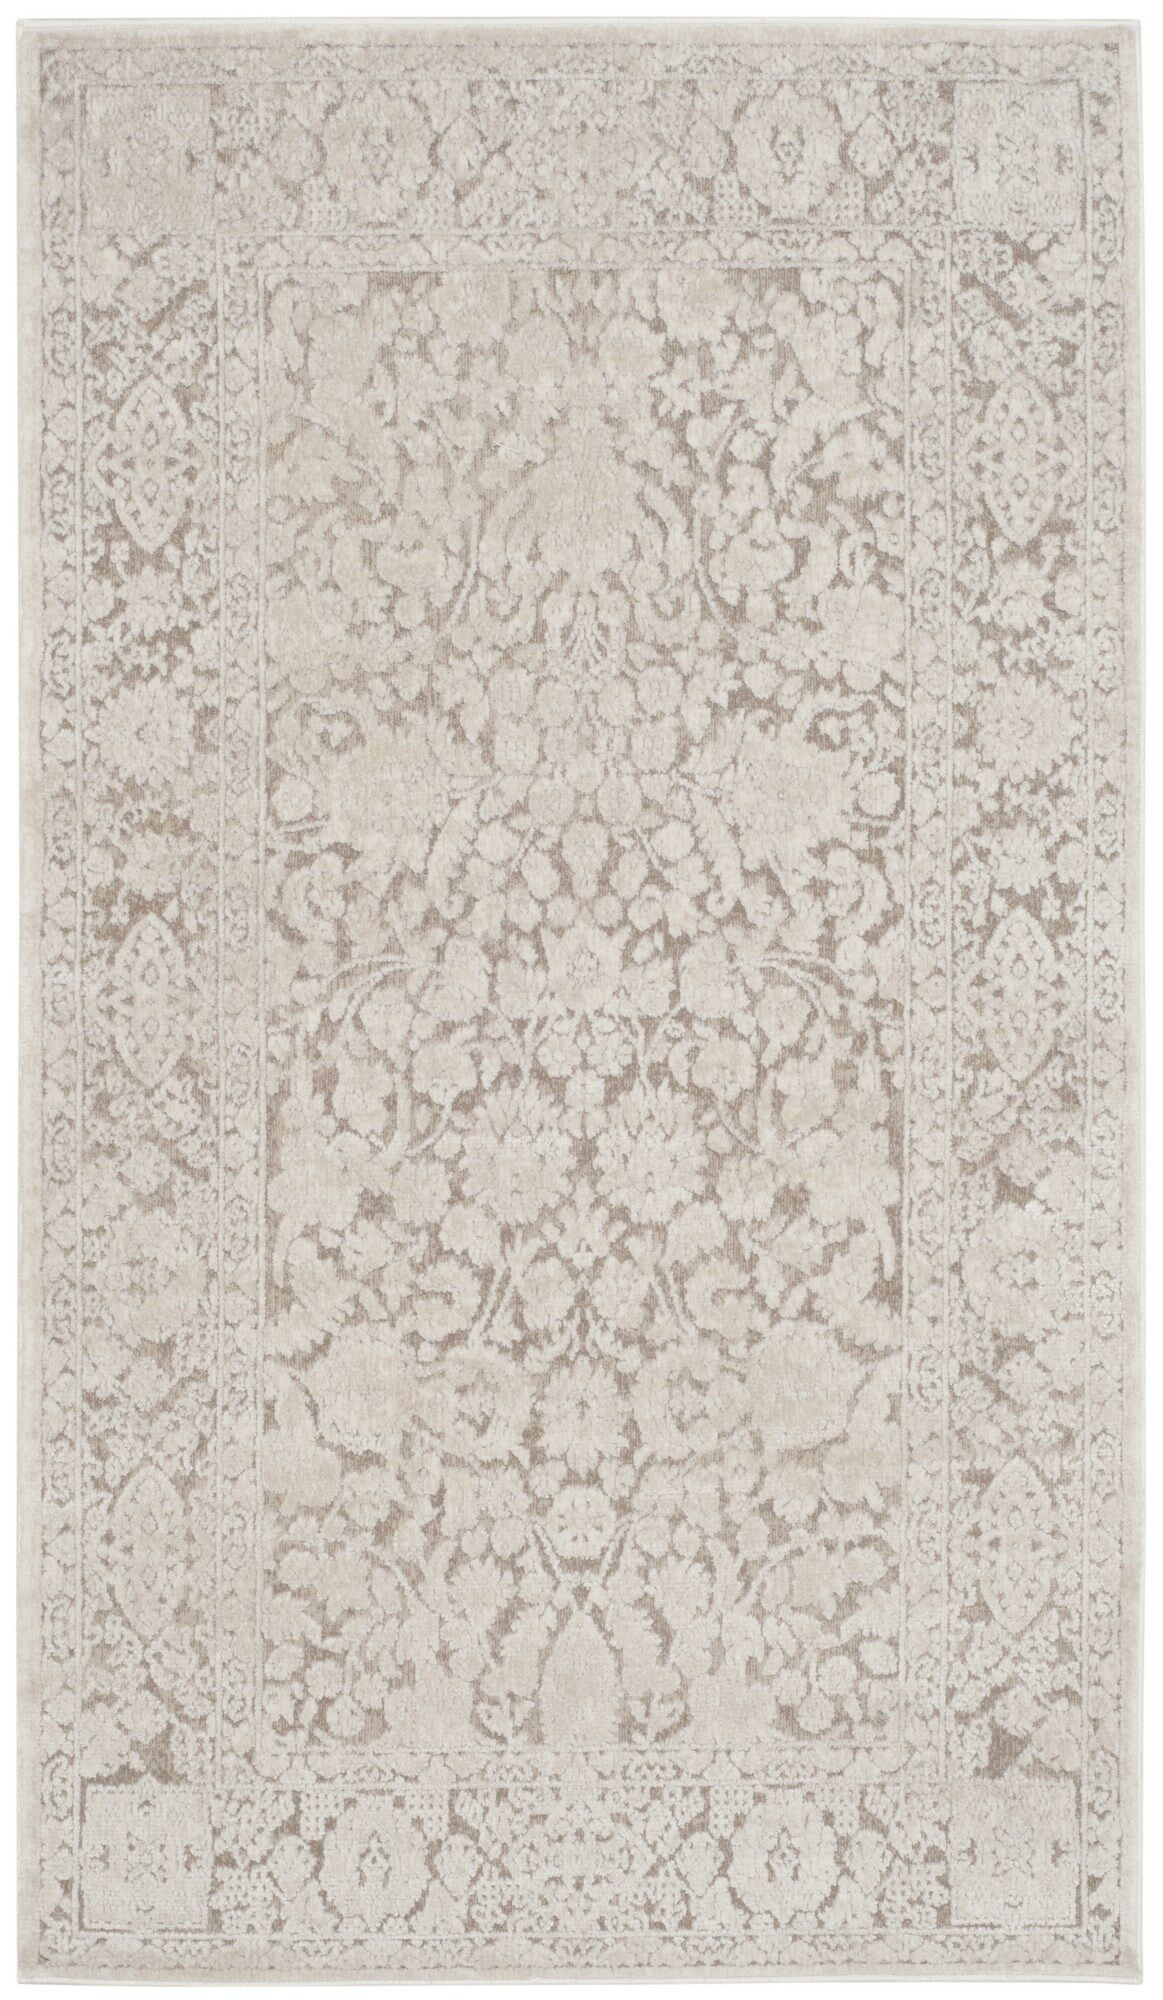 Pellot Beige/Cream Area Rug Rug Size: Rectangle 8' x 10'